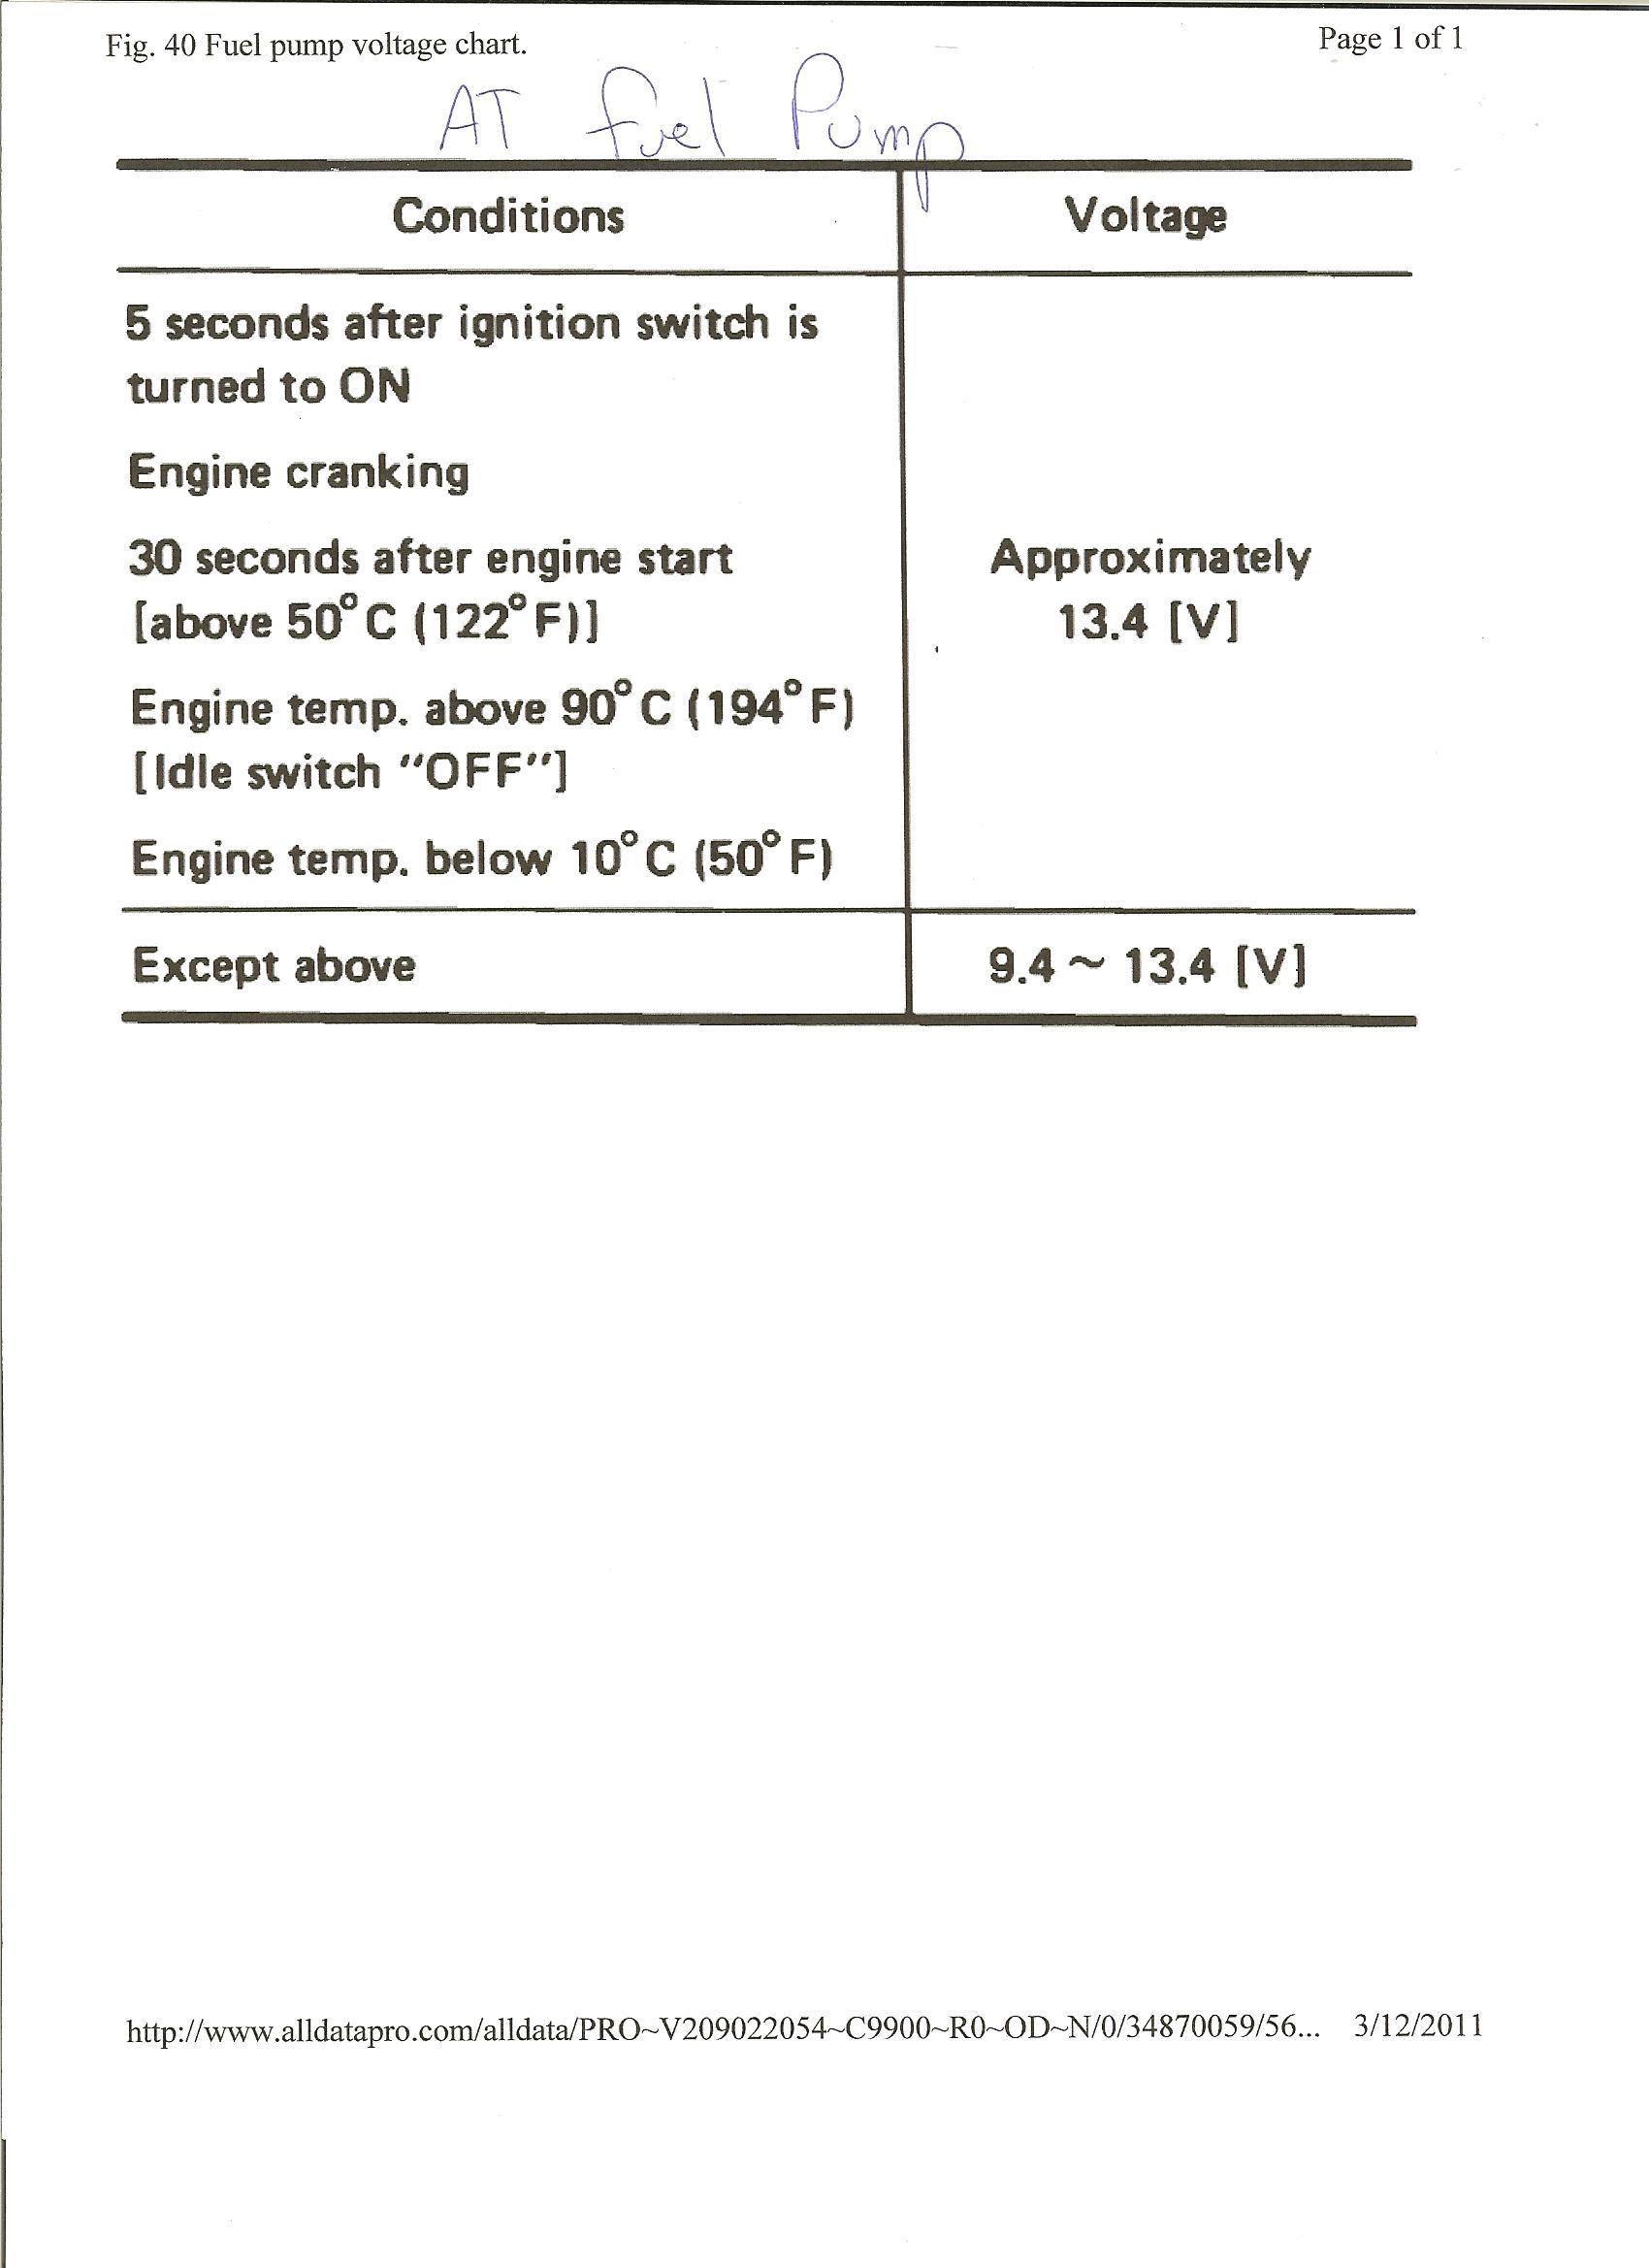 1986 Nissan 300Zx Fuel Pump - Ask Your Own Nissan Question - 1986 Nissan 300Zx Fuel Pump